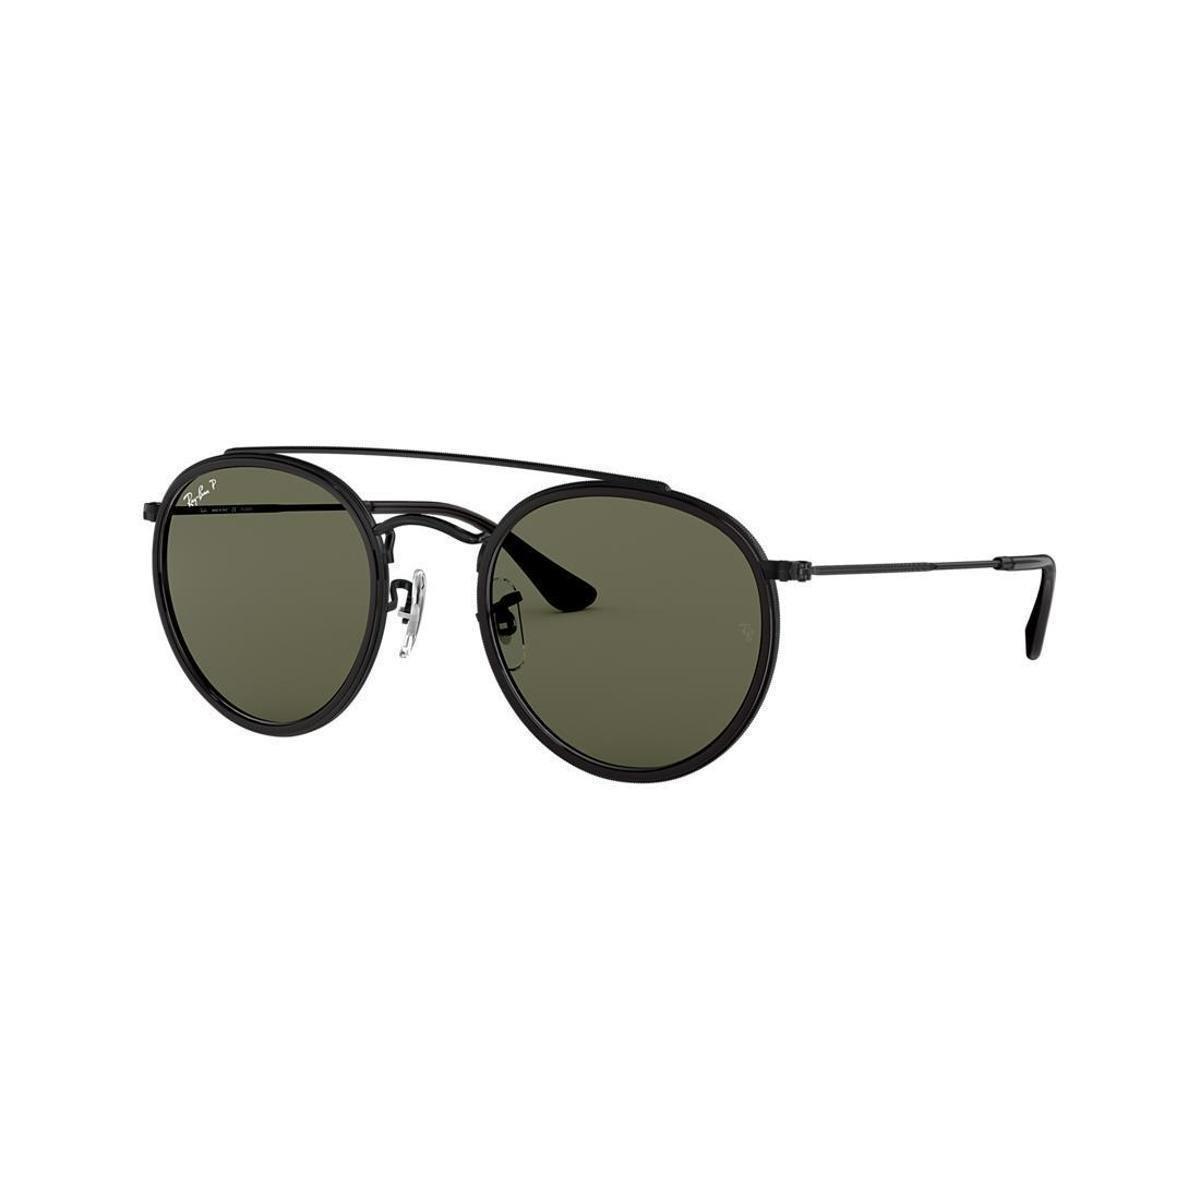 5977f7f8b Óculos de Sol Ray-Ban RB3647N - Preto | Netshoes